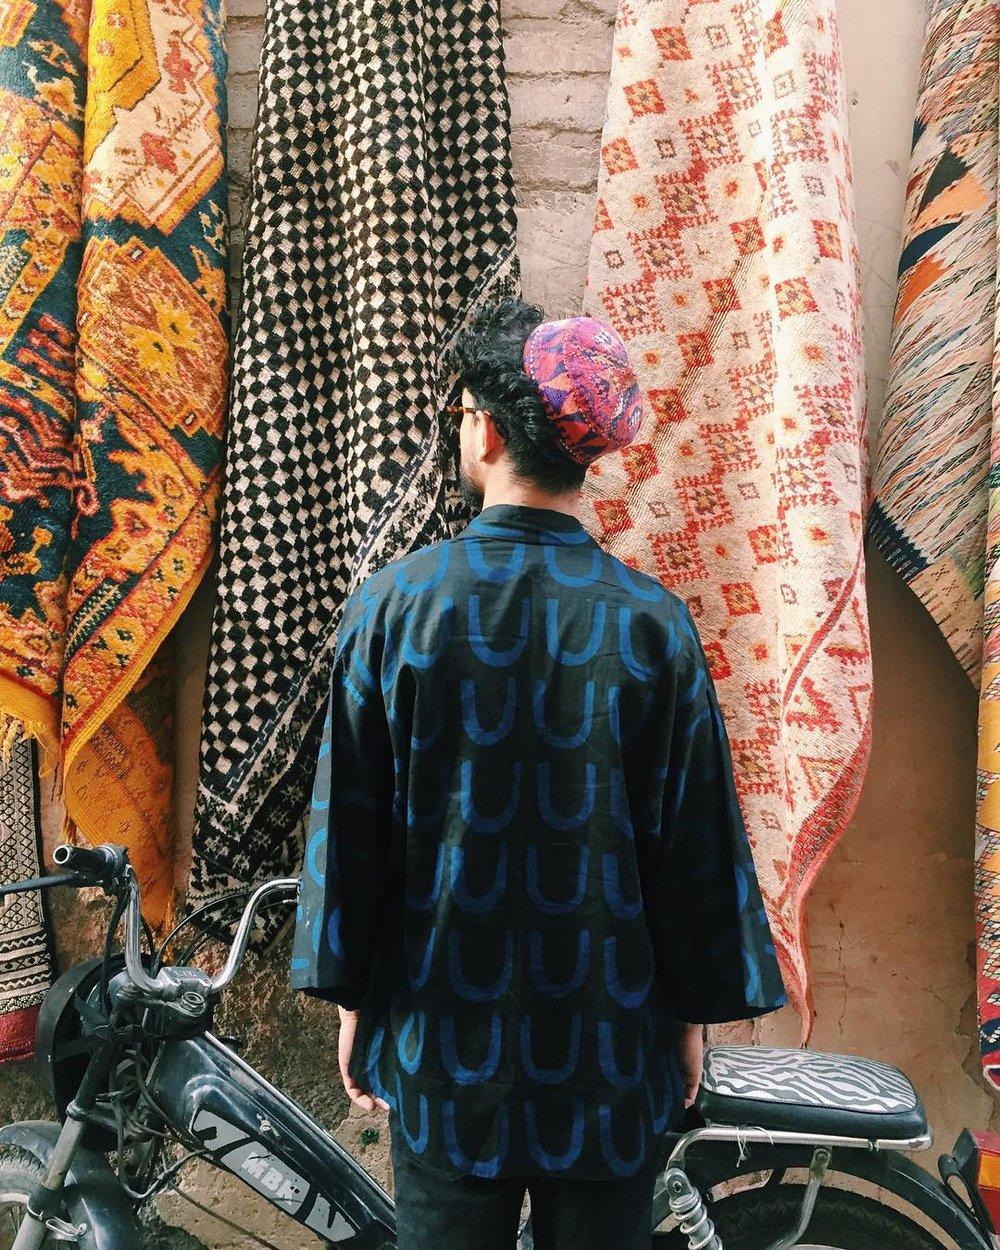 moroccan rug shopping by thread caravan.jpg